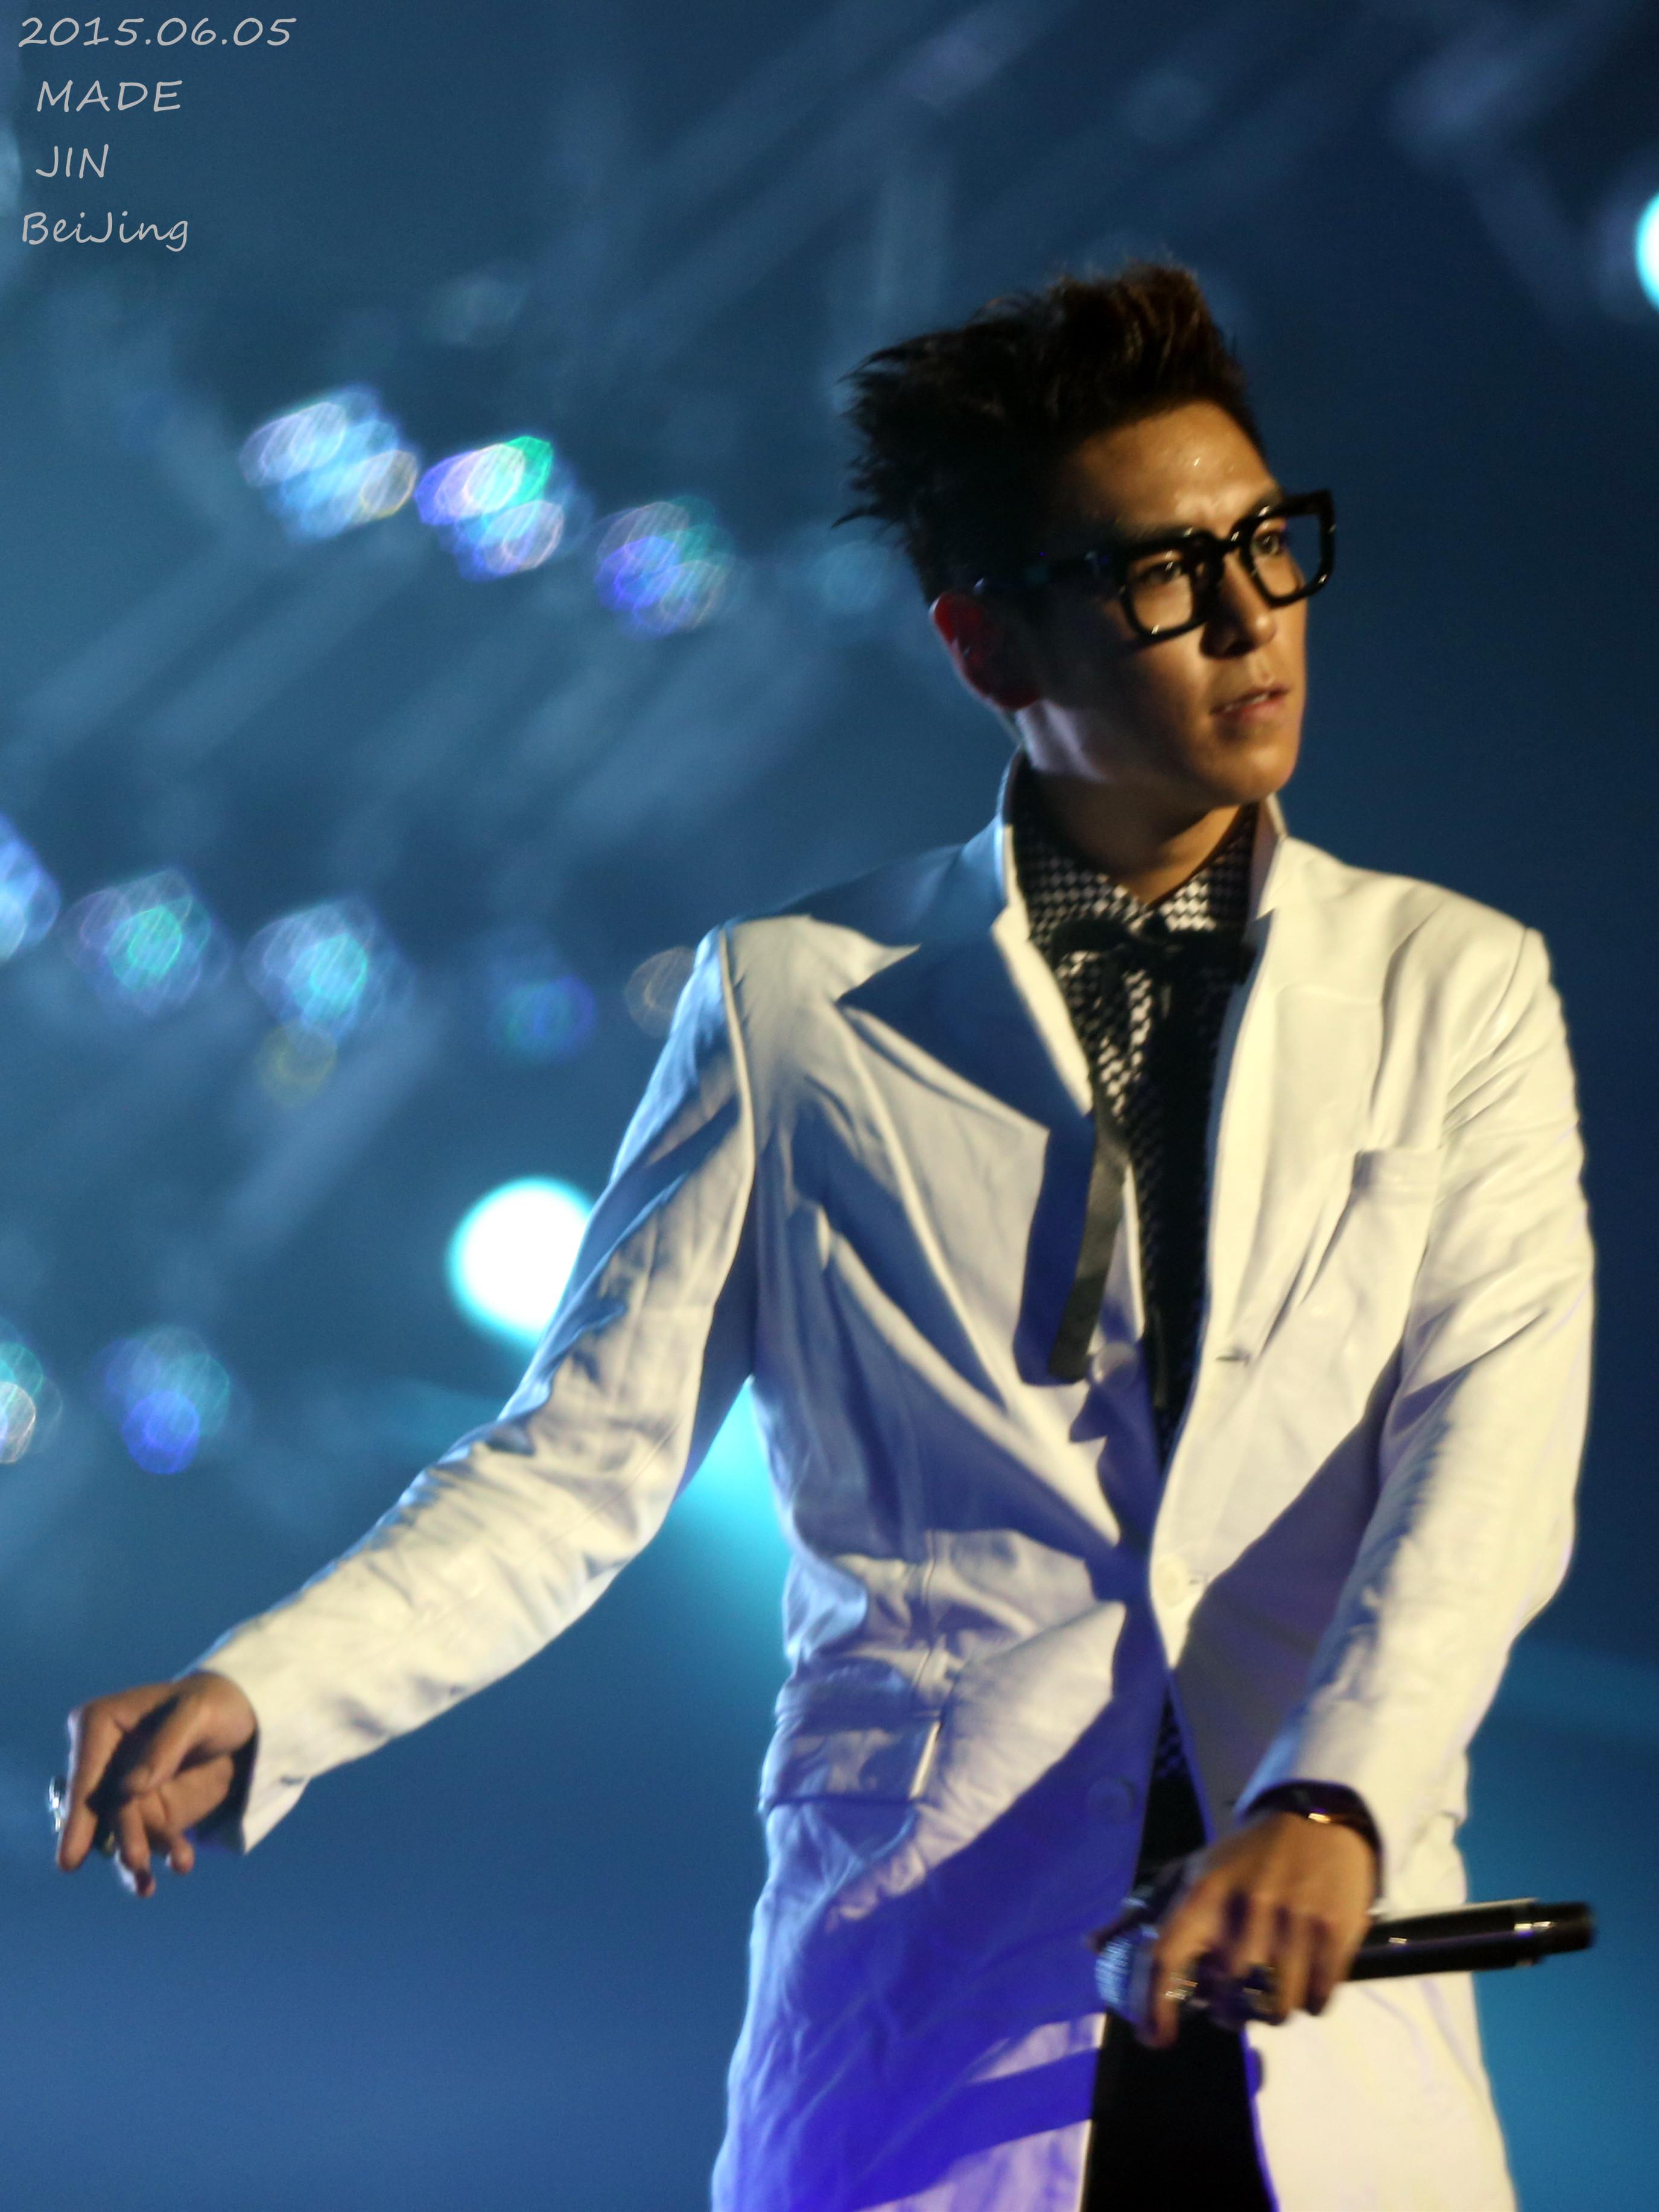 BIGBANG - Made Tour 2015 - Beijing - 05jun2015 - G-Jin - 09.jpg